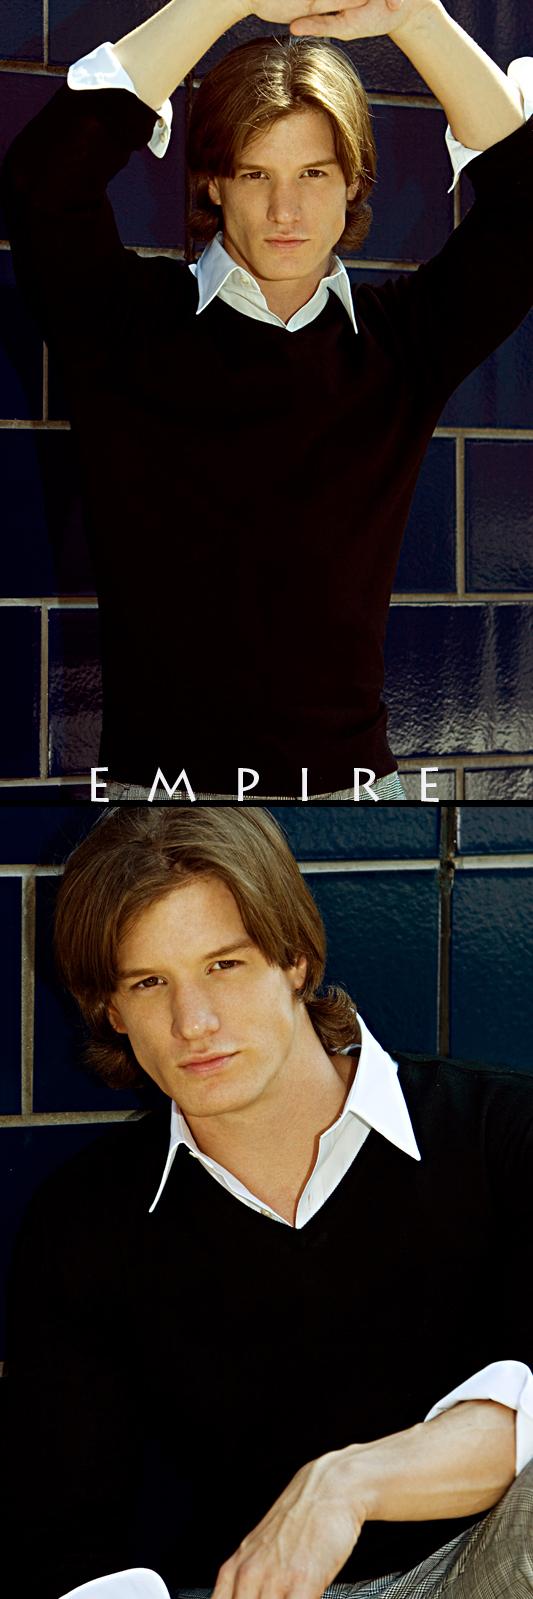 Aug 30, 2008 Empire Studios